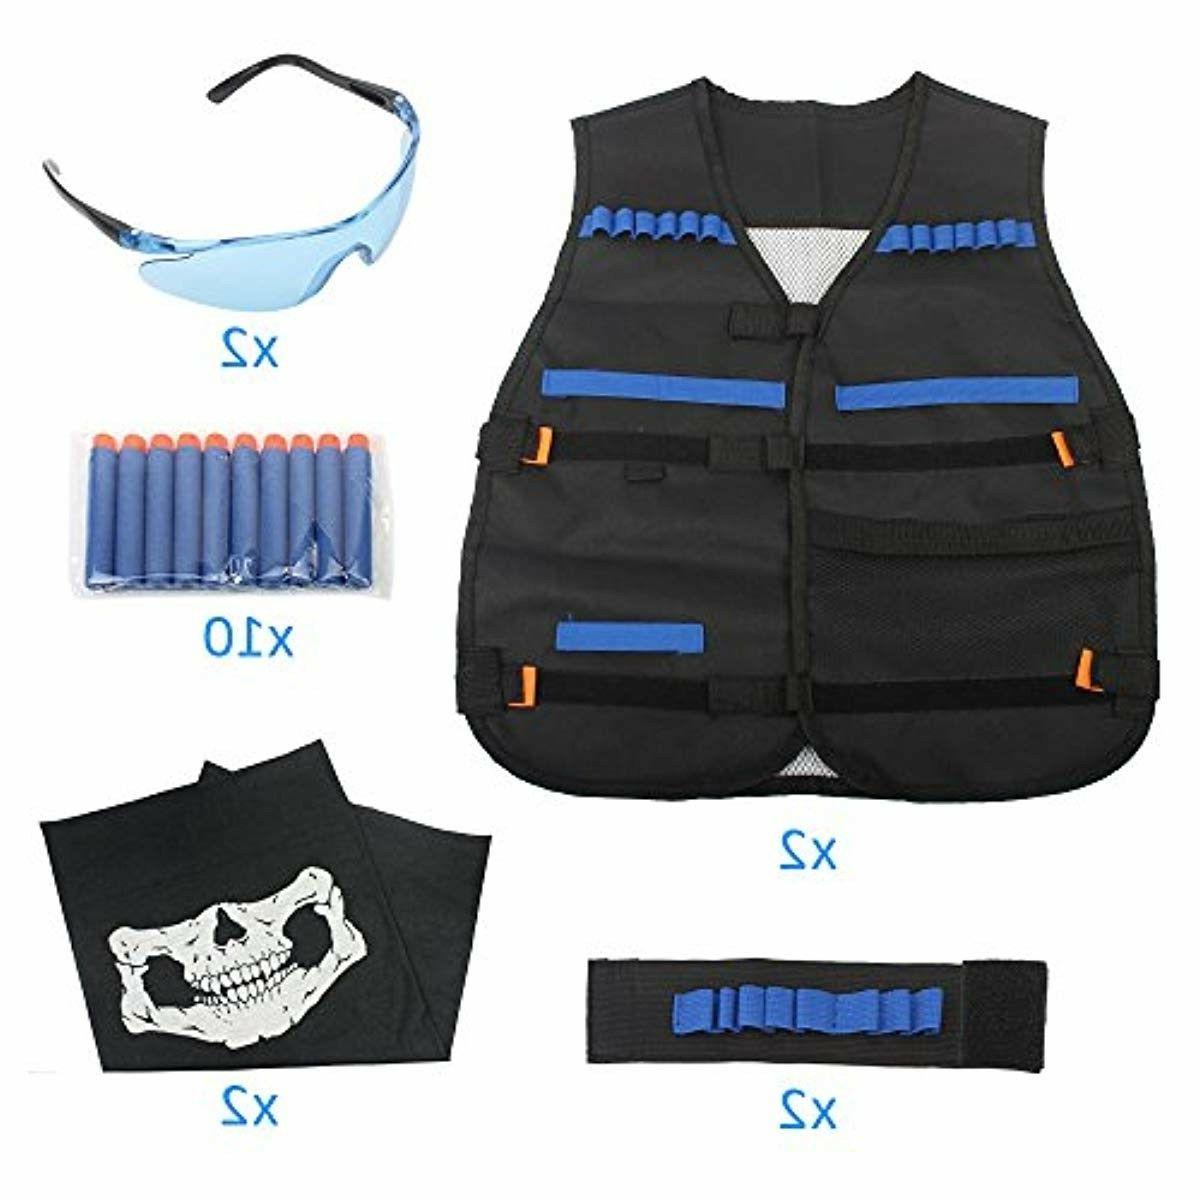 2 Set Suit Jacket Kit Series